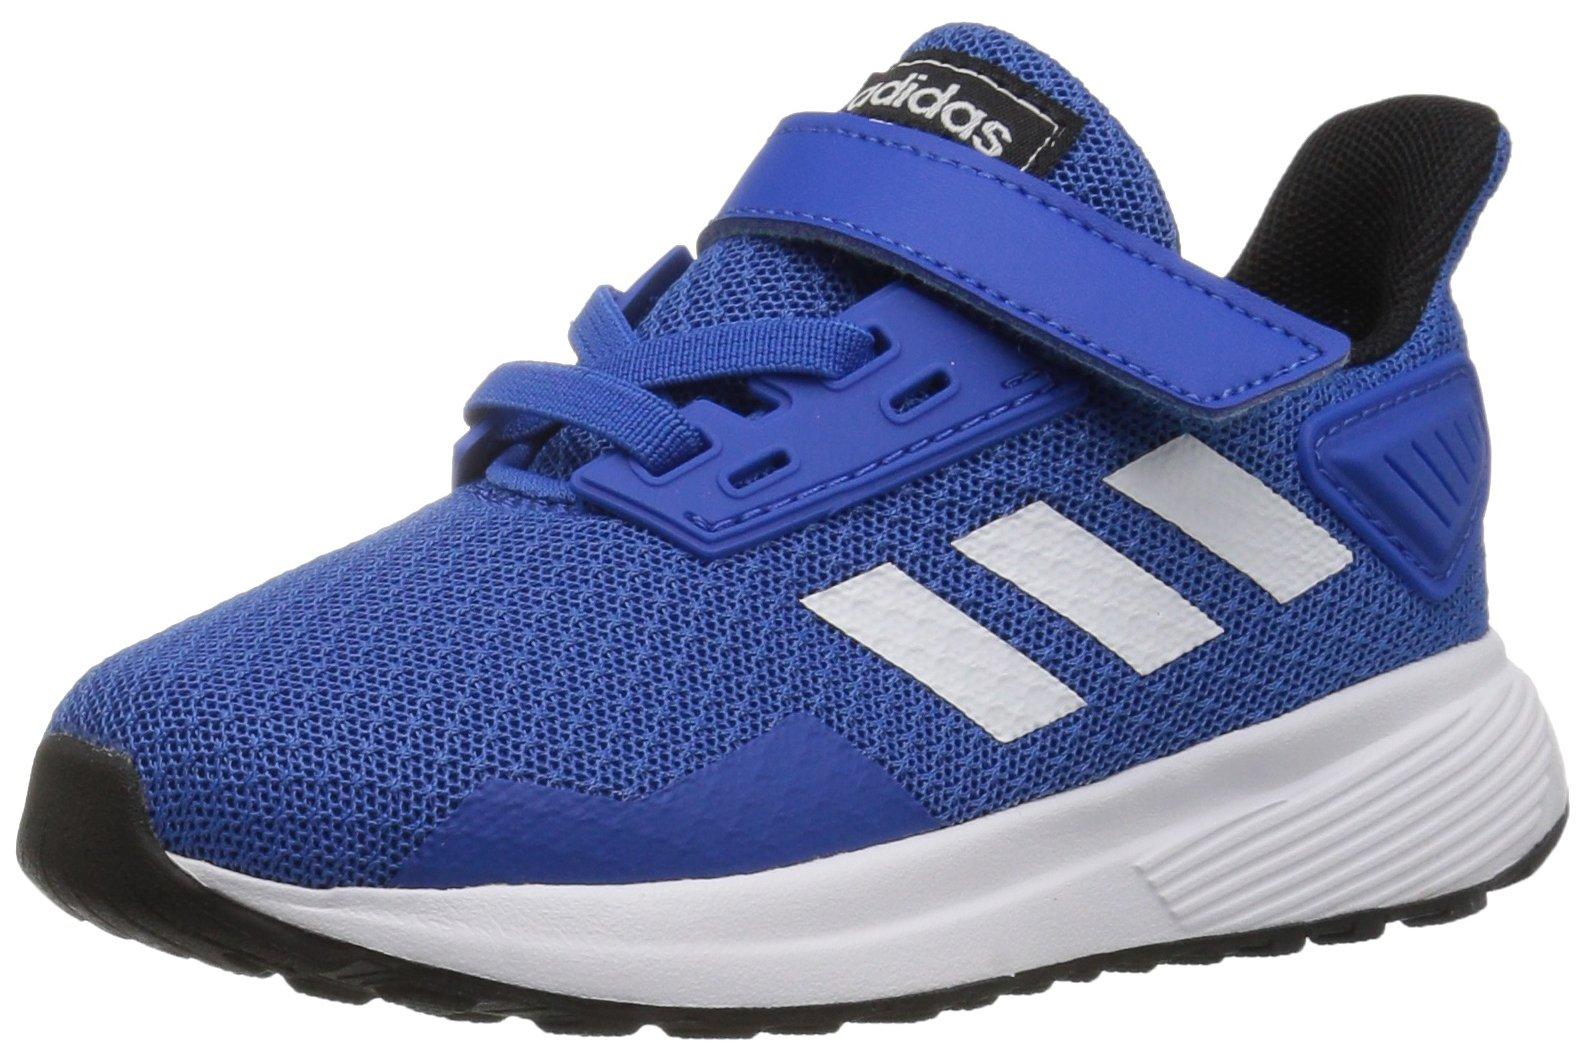 adidas Performance Unisex-Kids Duramo 9 Running Shoe, Blue/White/Black, 1.5 M US Little Kid